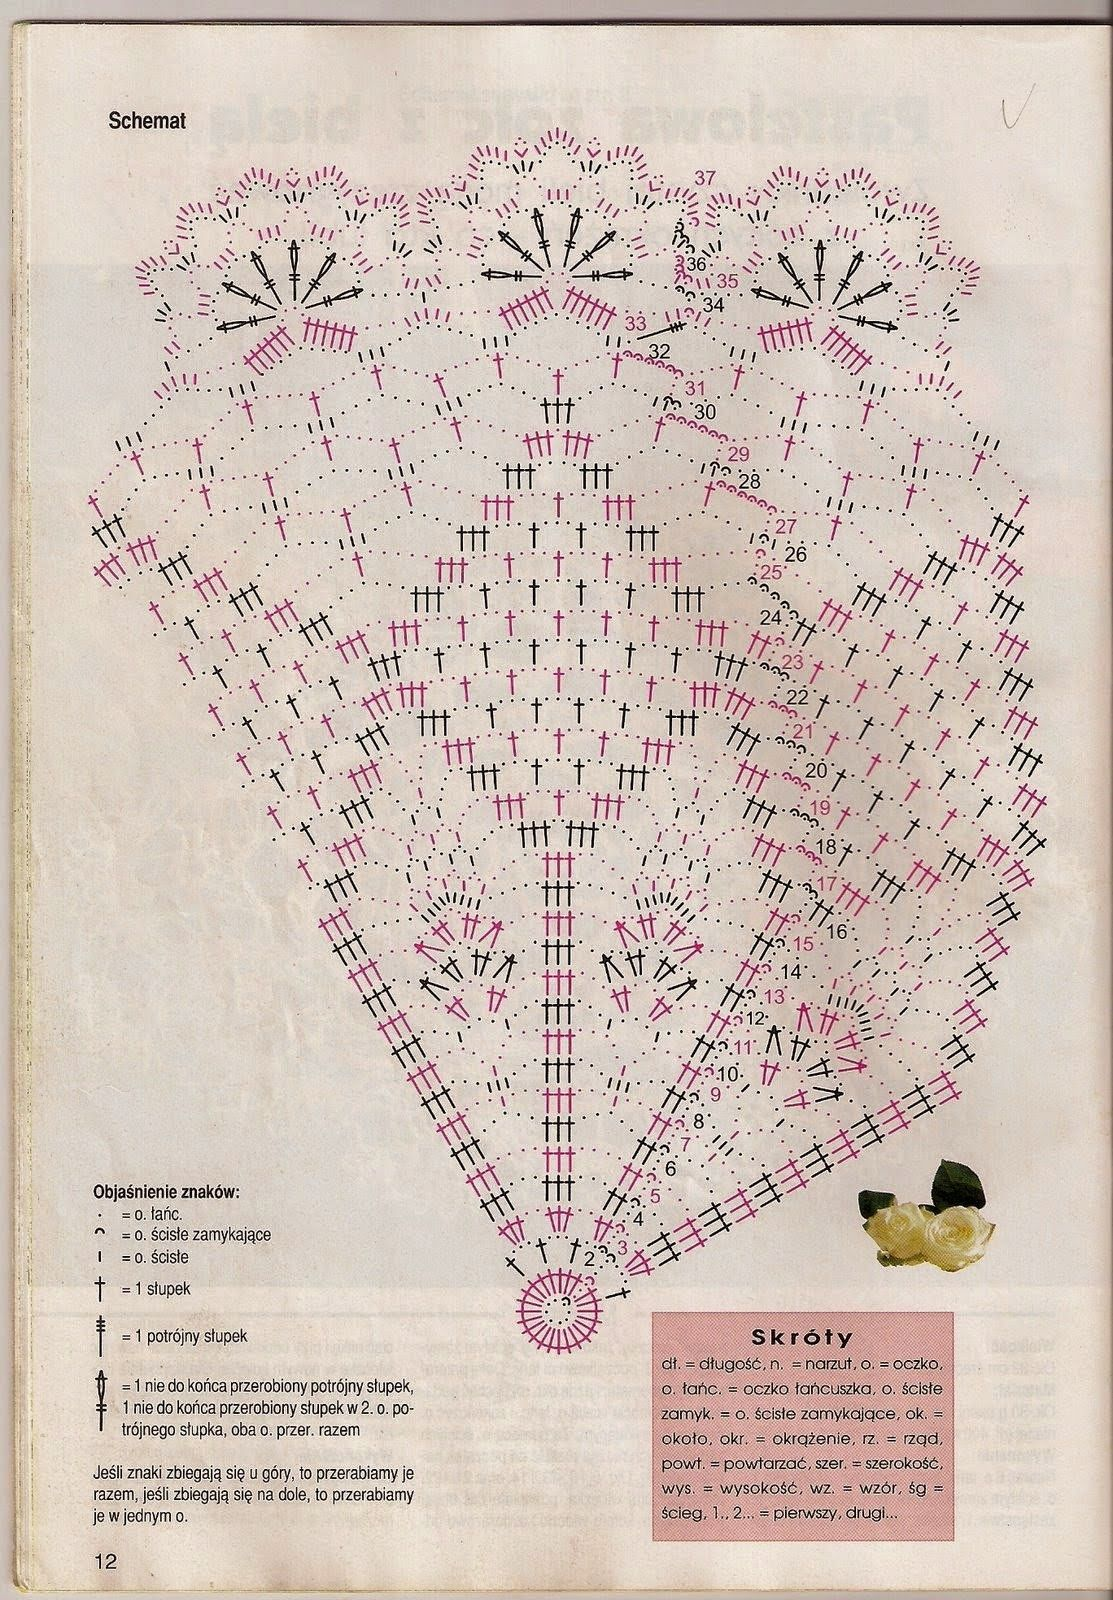 PATRONES CROCHET: ESQUEMAS CROCHET PARA HOY | frazadas diseño ...